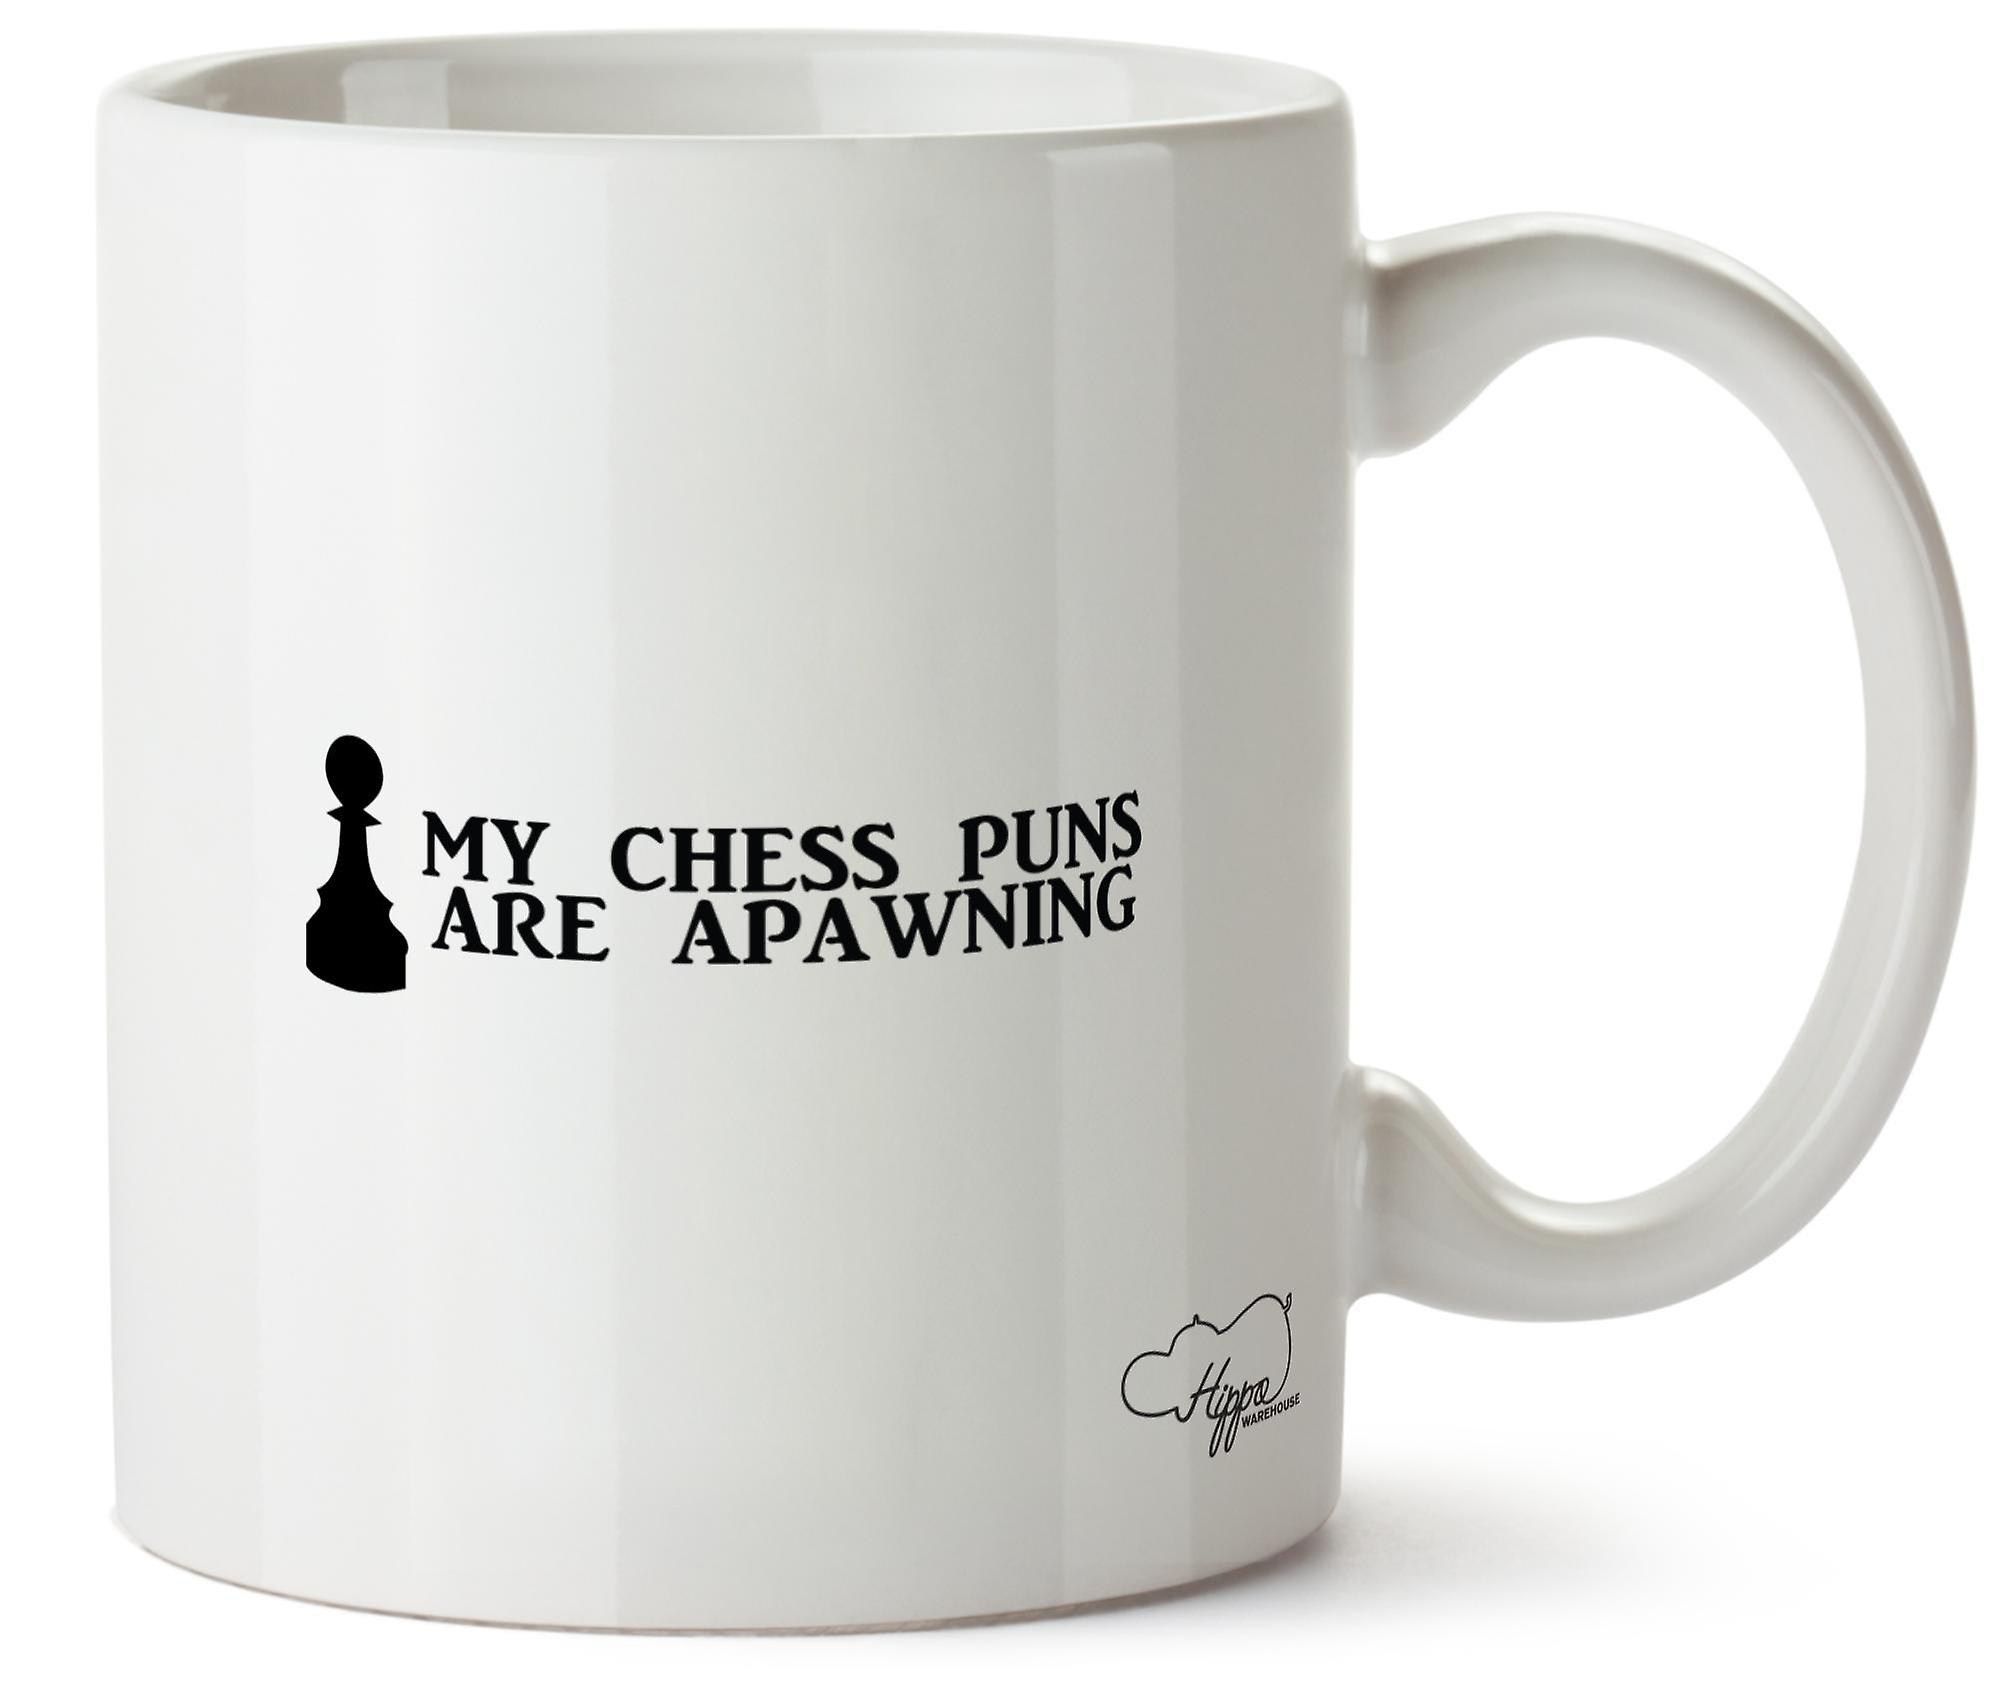 Hippowarehouse My Chess Puns Are Apawning Printed Mug Cup Ceramic 10oz